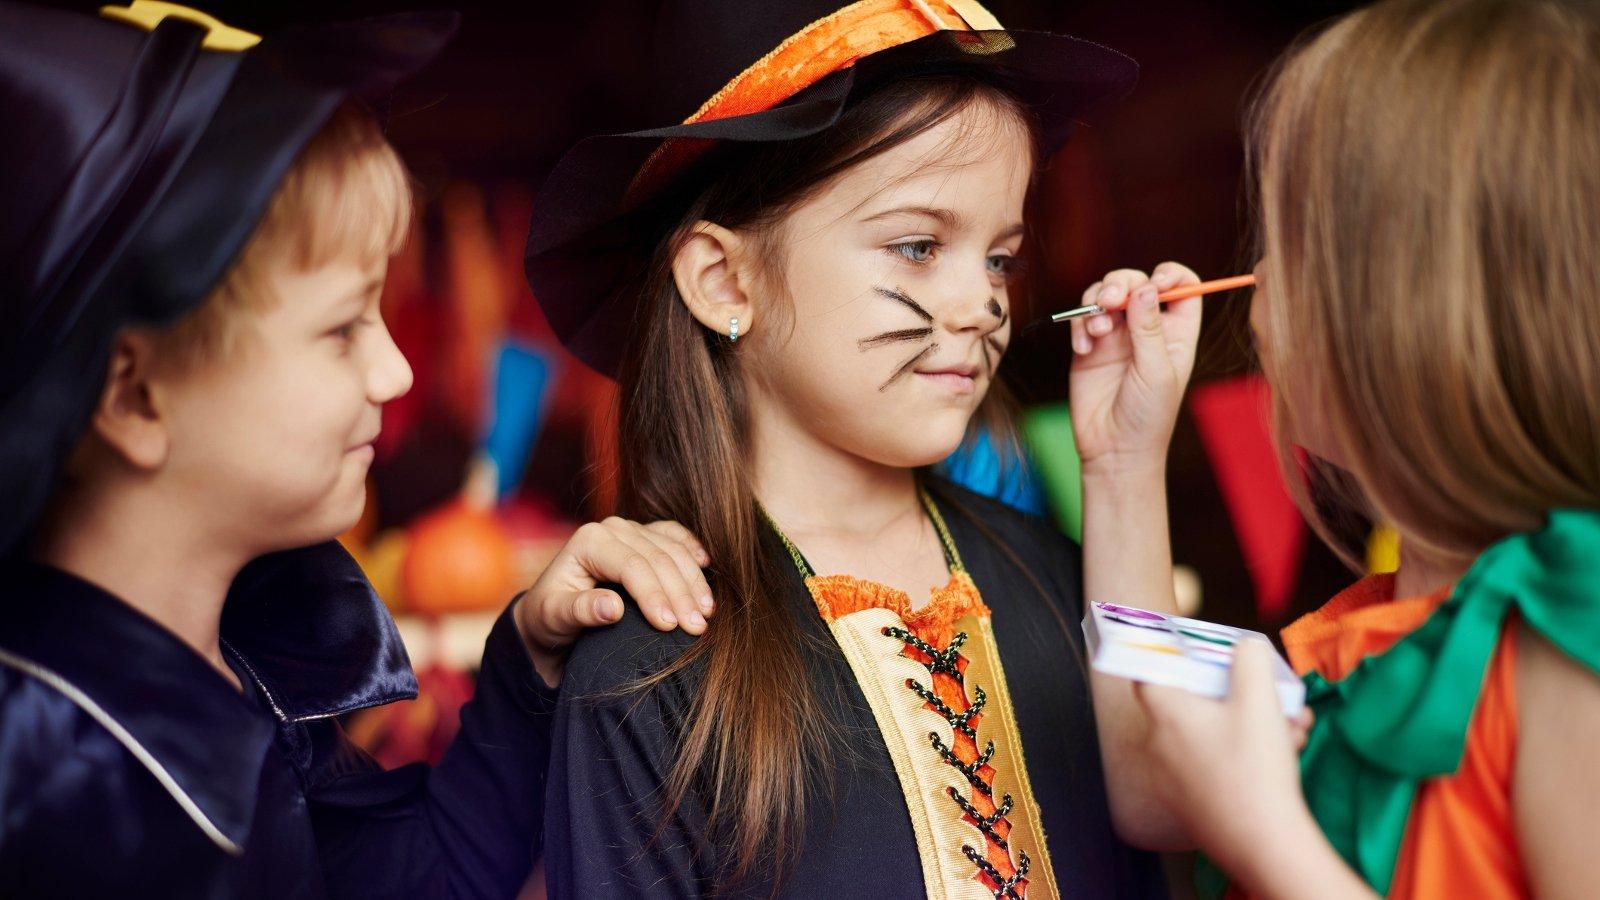 5 Easy Halloween Face Painting Ideas